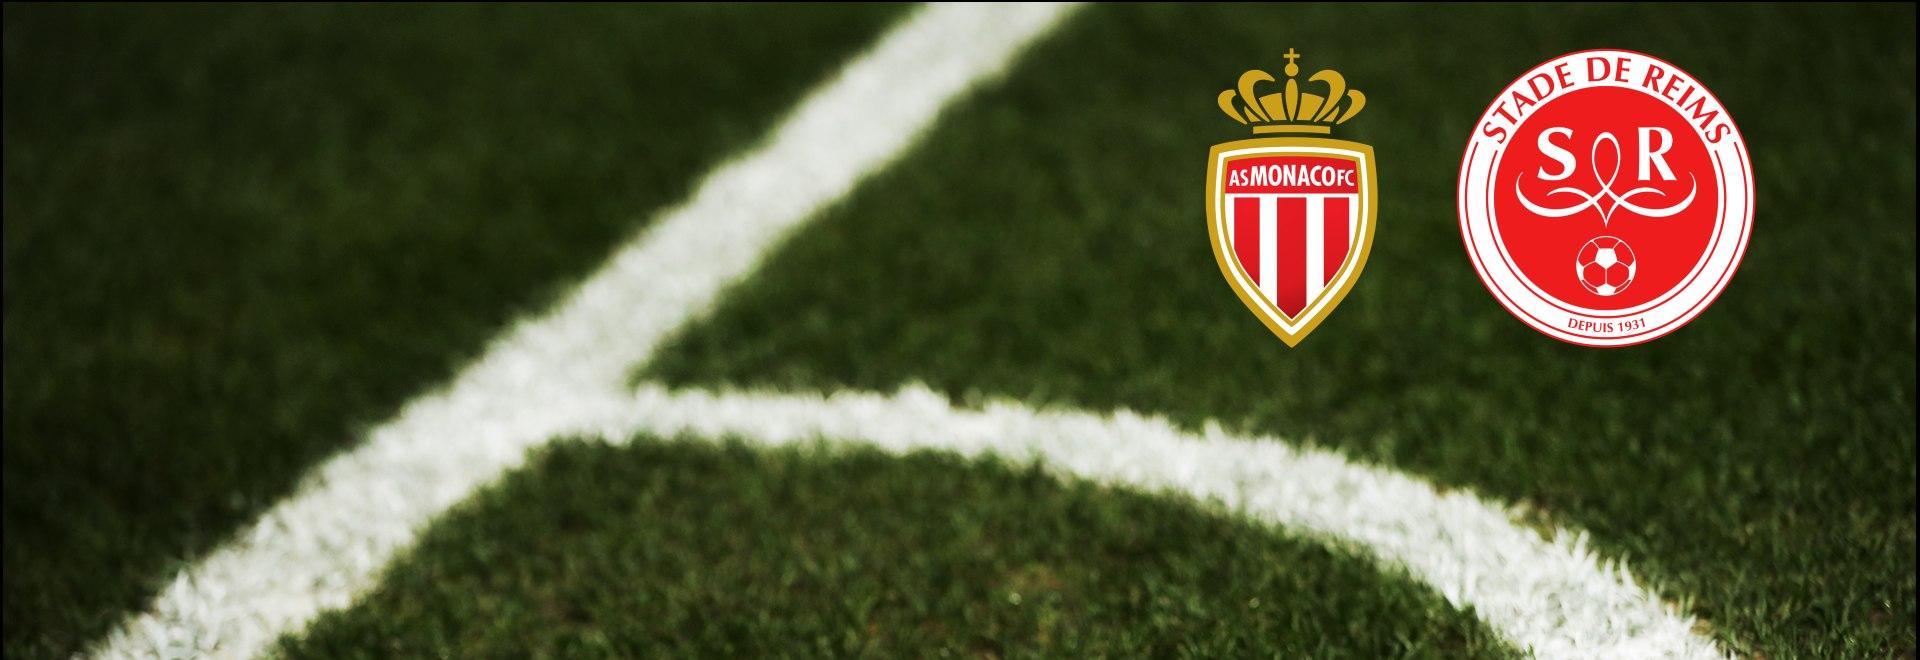 Monaco - Reims. 1a g.